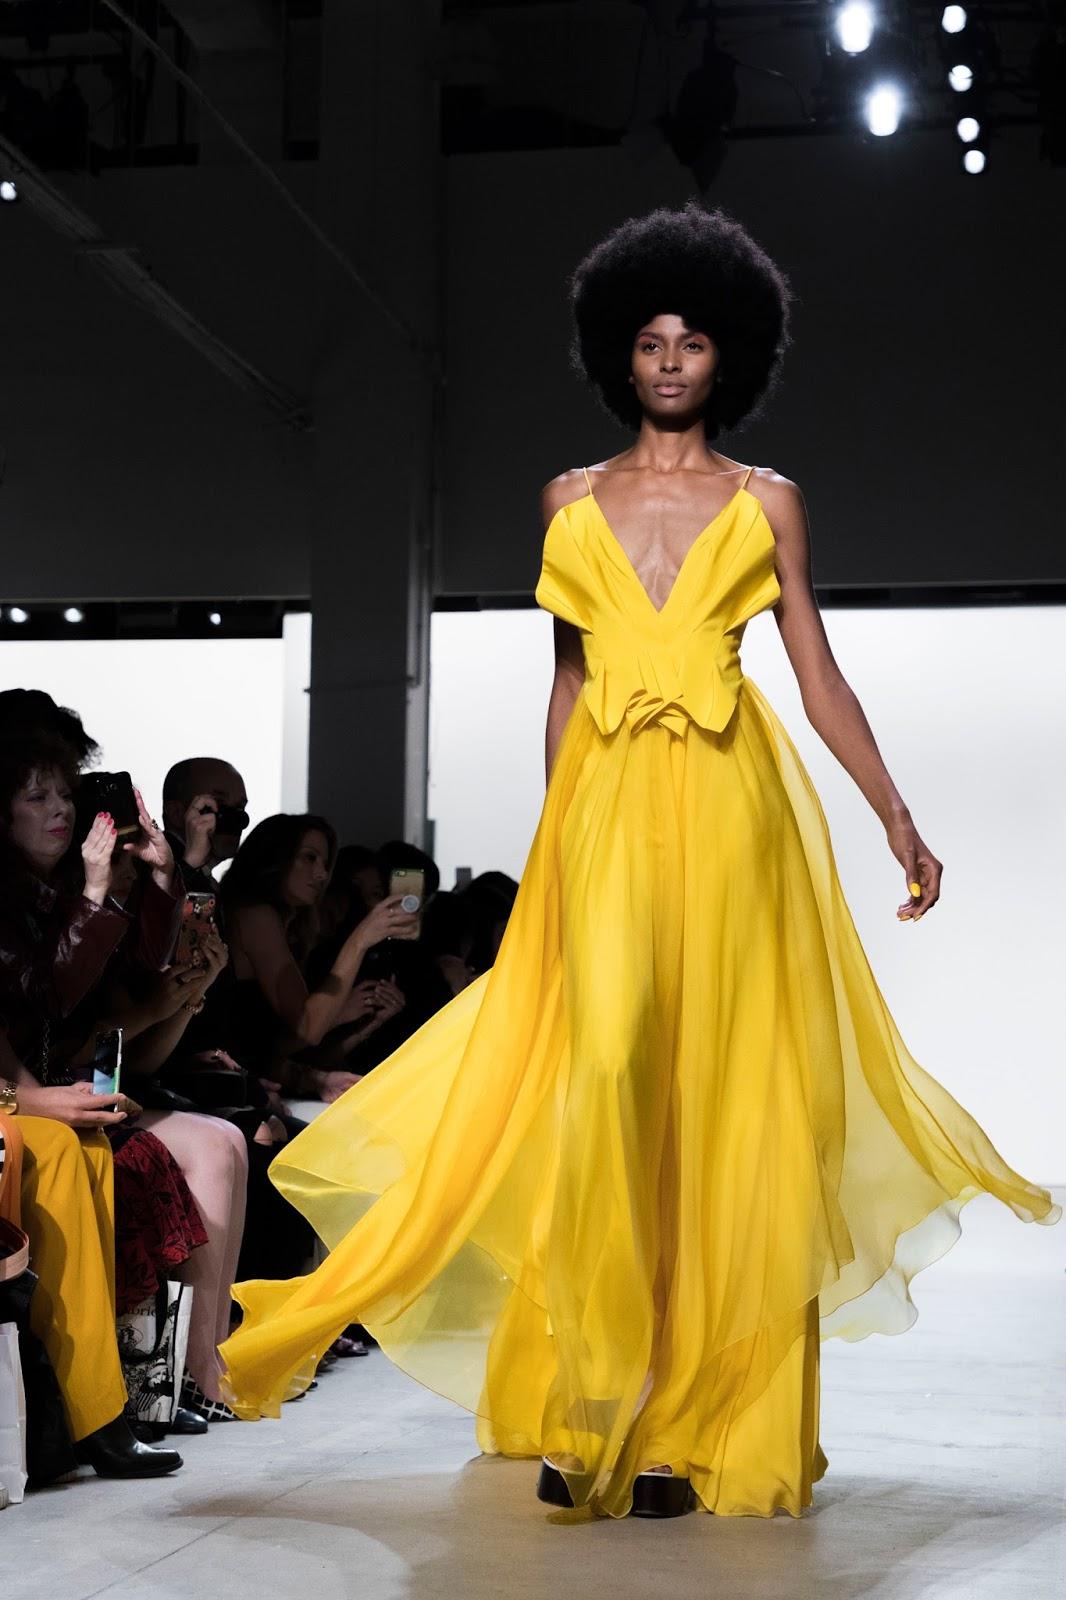 LeanneMarshallSS18 , what i wore, NYFW, print on print, karen millen printed skirt, dove print jacket, banana republic blouse, color, street style, saumya